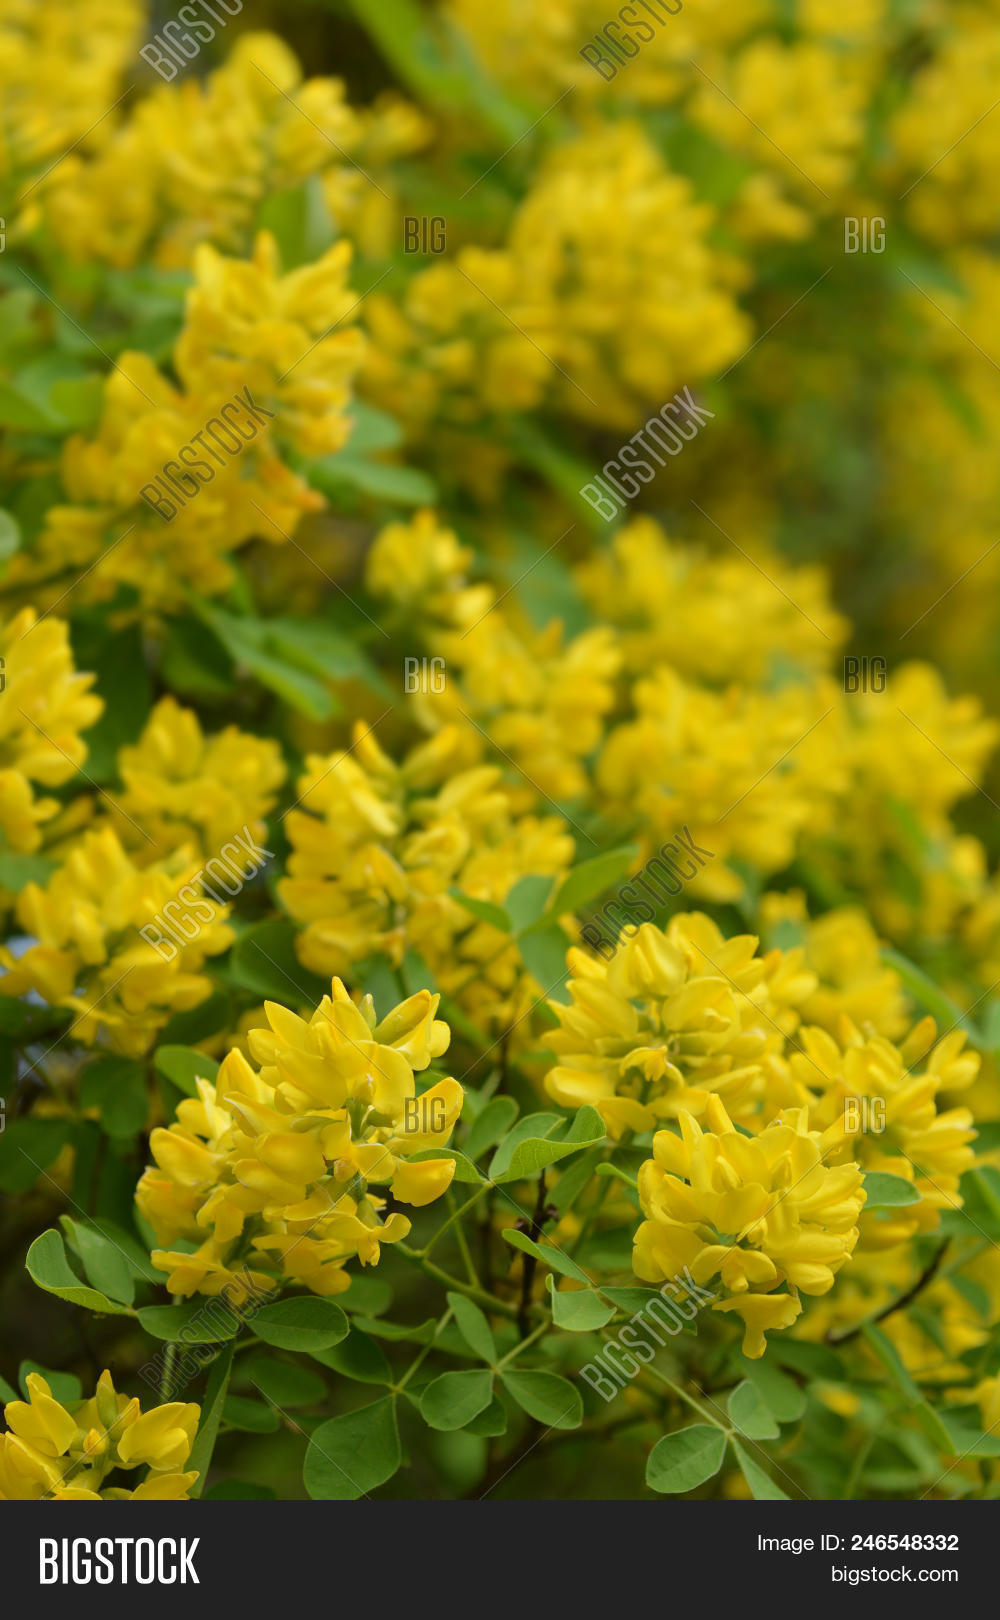 Dalmatian Laburnum Yellow Flowers And Buds Latin Name